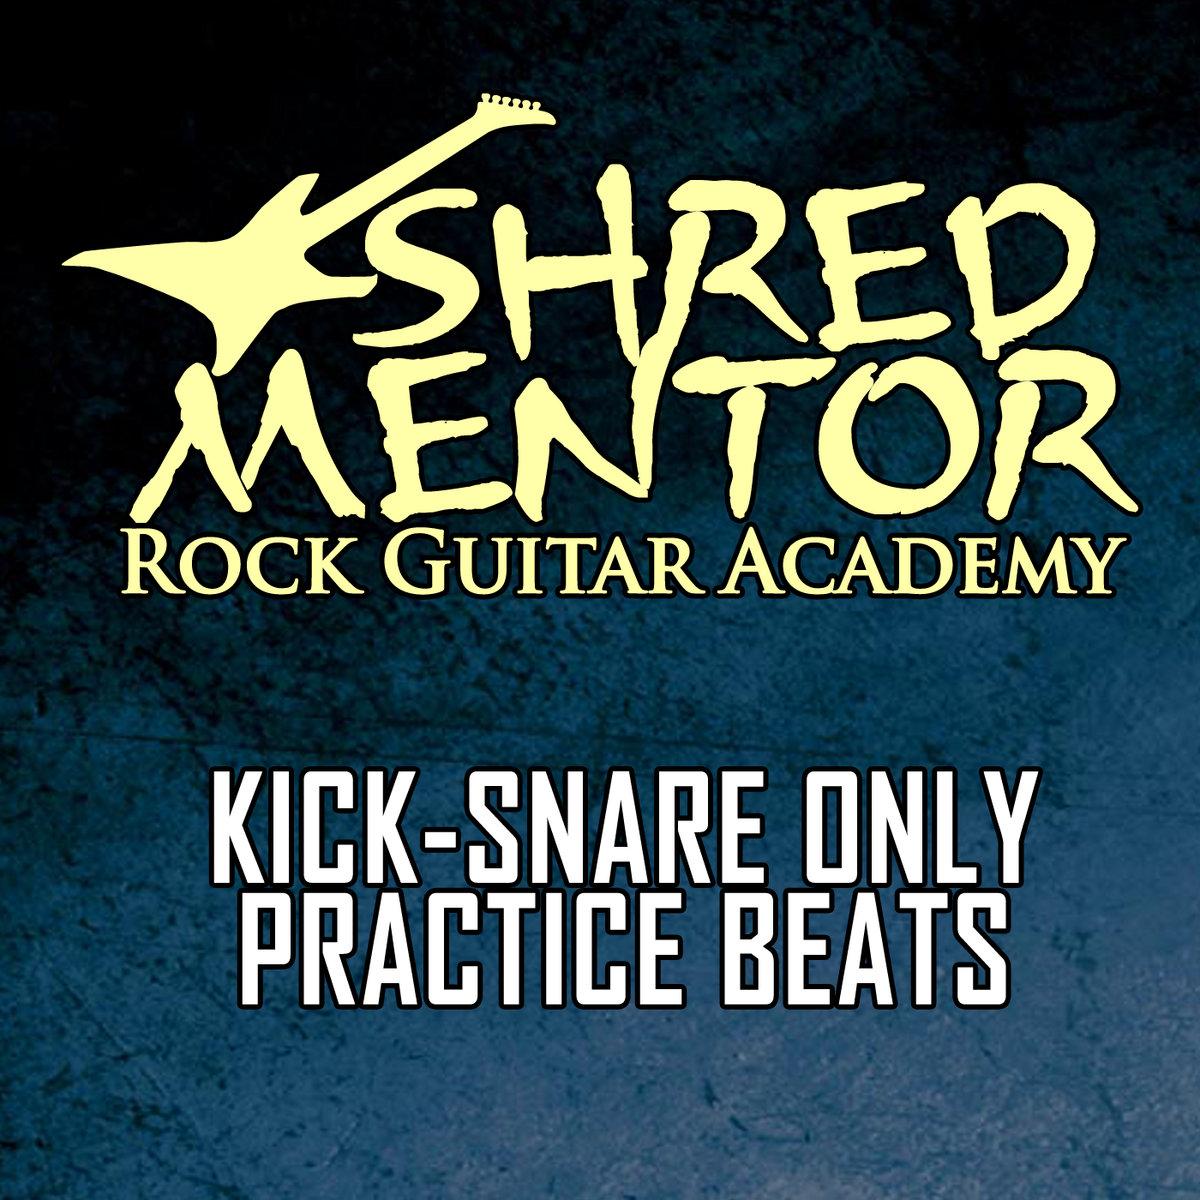 Kick-Snare 90 bpm | ShredMentor